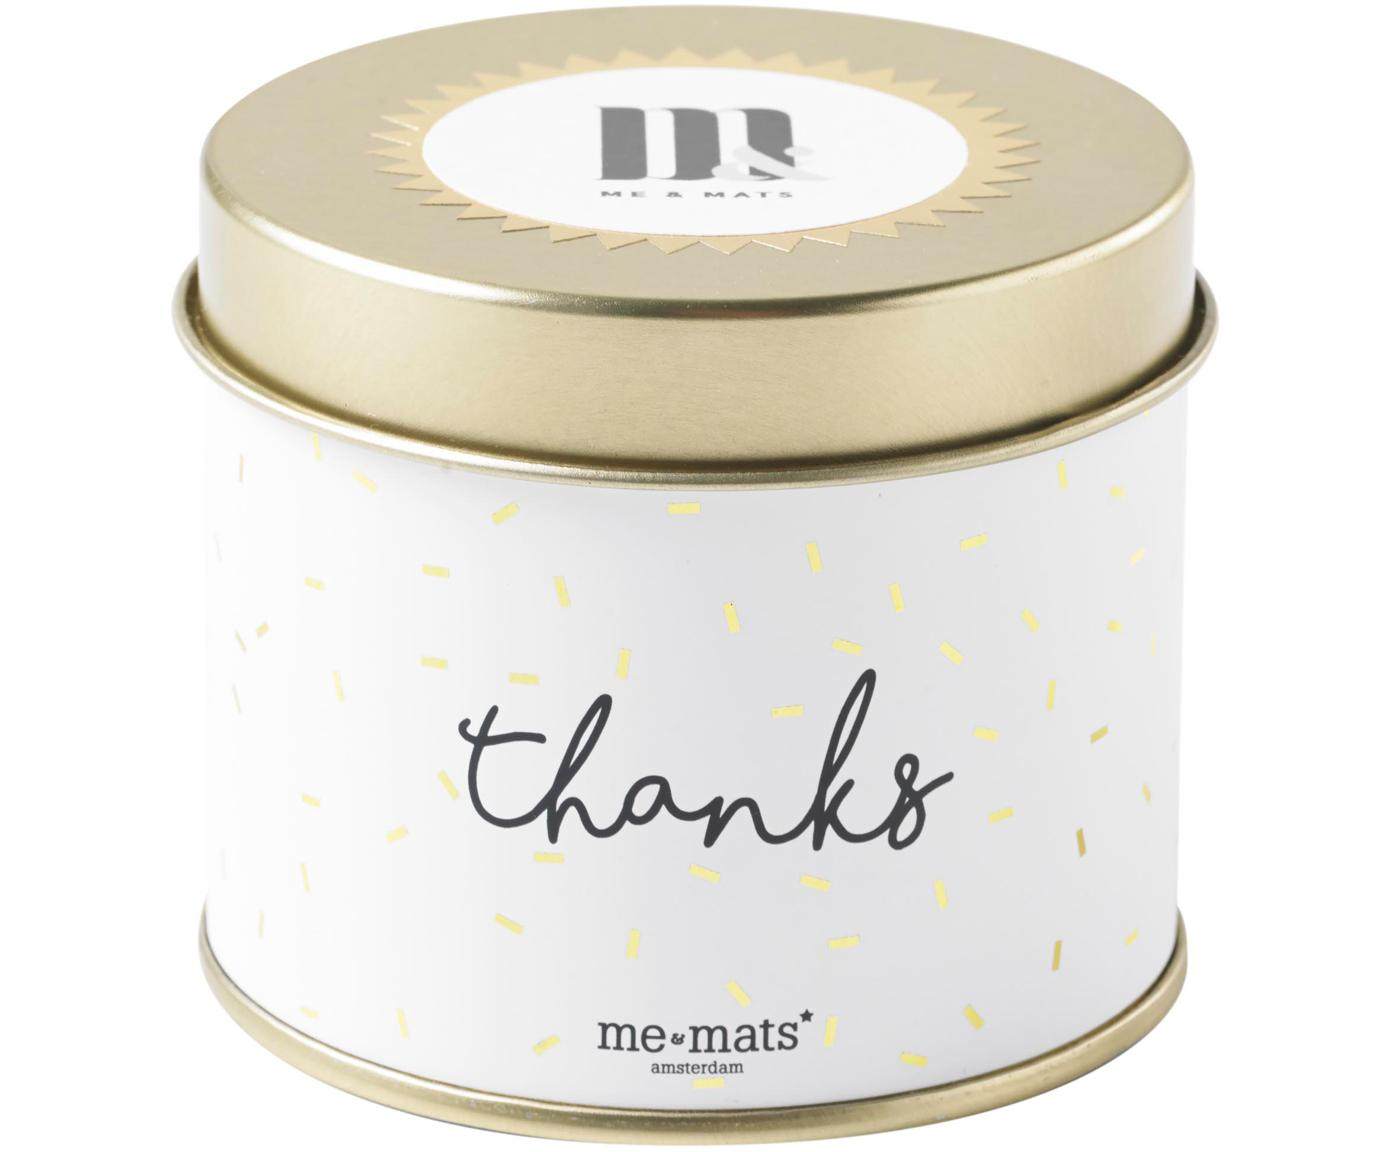 Duftkerze Thanks (Grapefruit, Patschuli & Wassermelone), Behälter: Metall, beschichtet, Goldfarben, Weiß, Schwarz, Ø 8 x H 7 cm